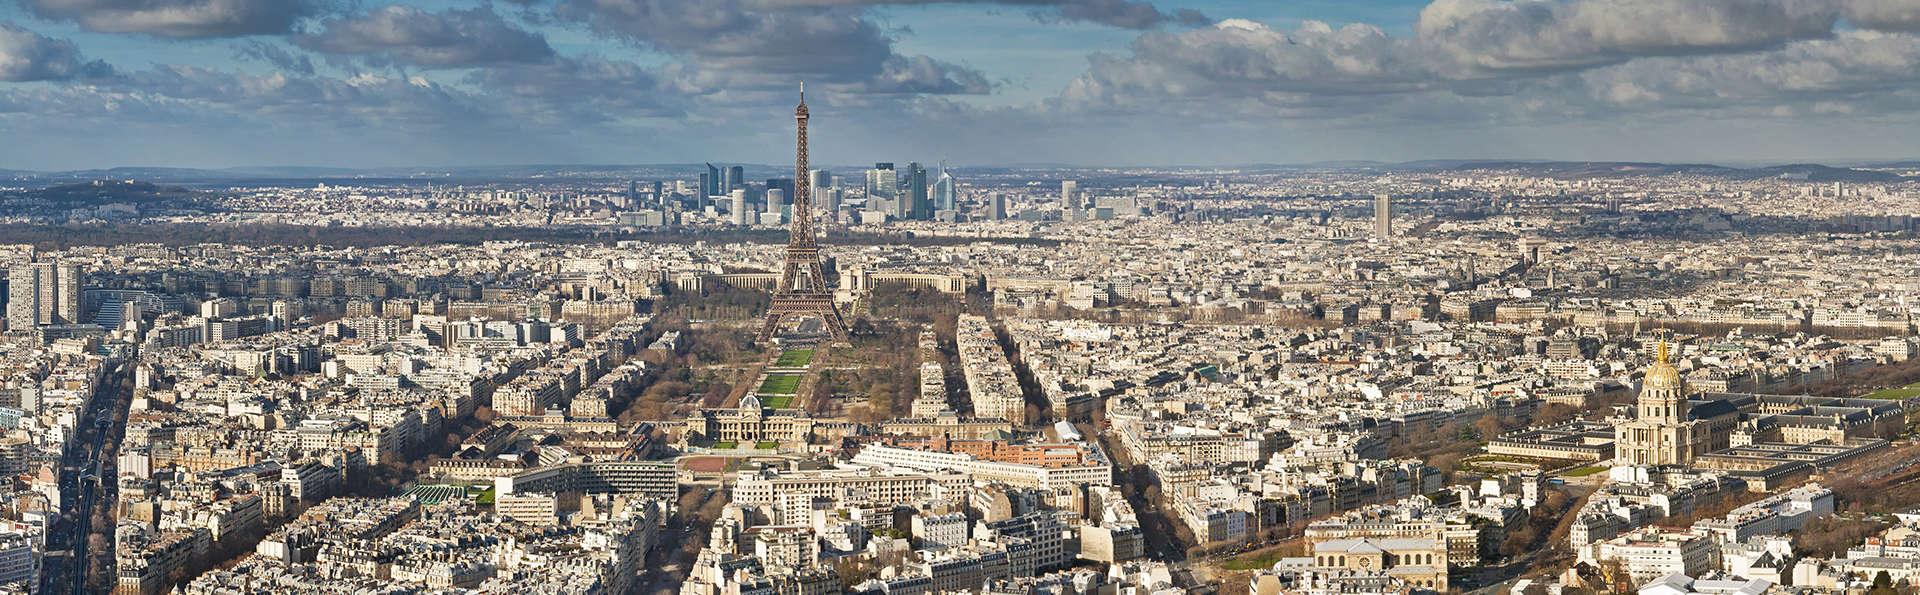 Timhotel Tour Eiffel - EDIT_Paris.jpg